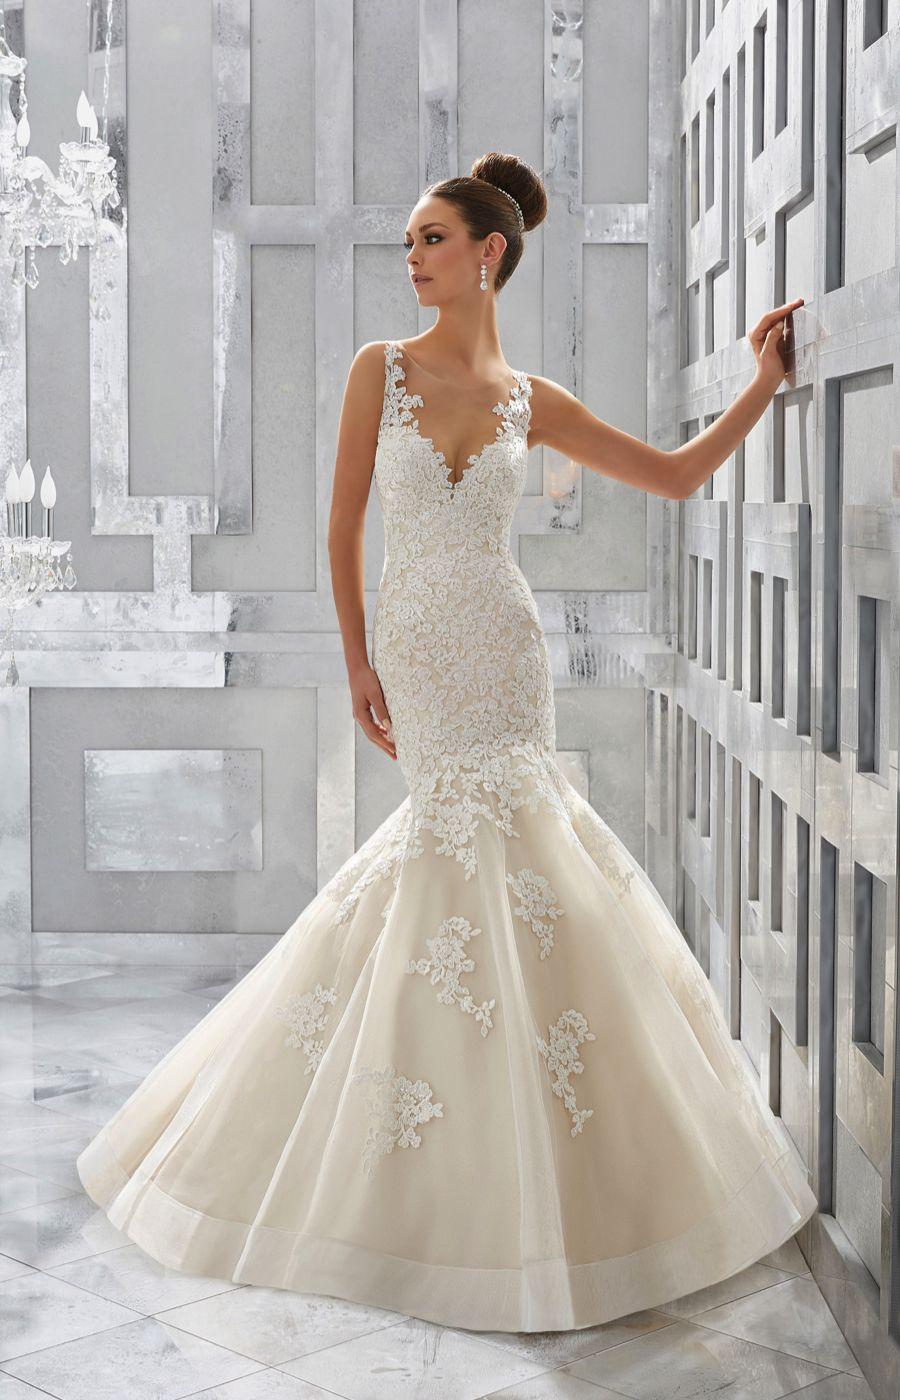 Style 5571, Meryl, Morilee Blu. Alençon lace appliqué fit